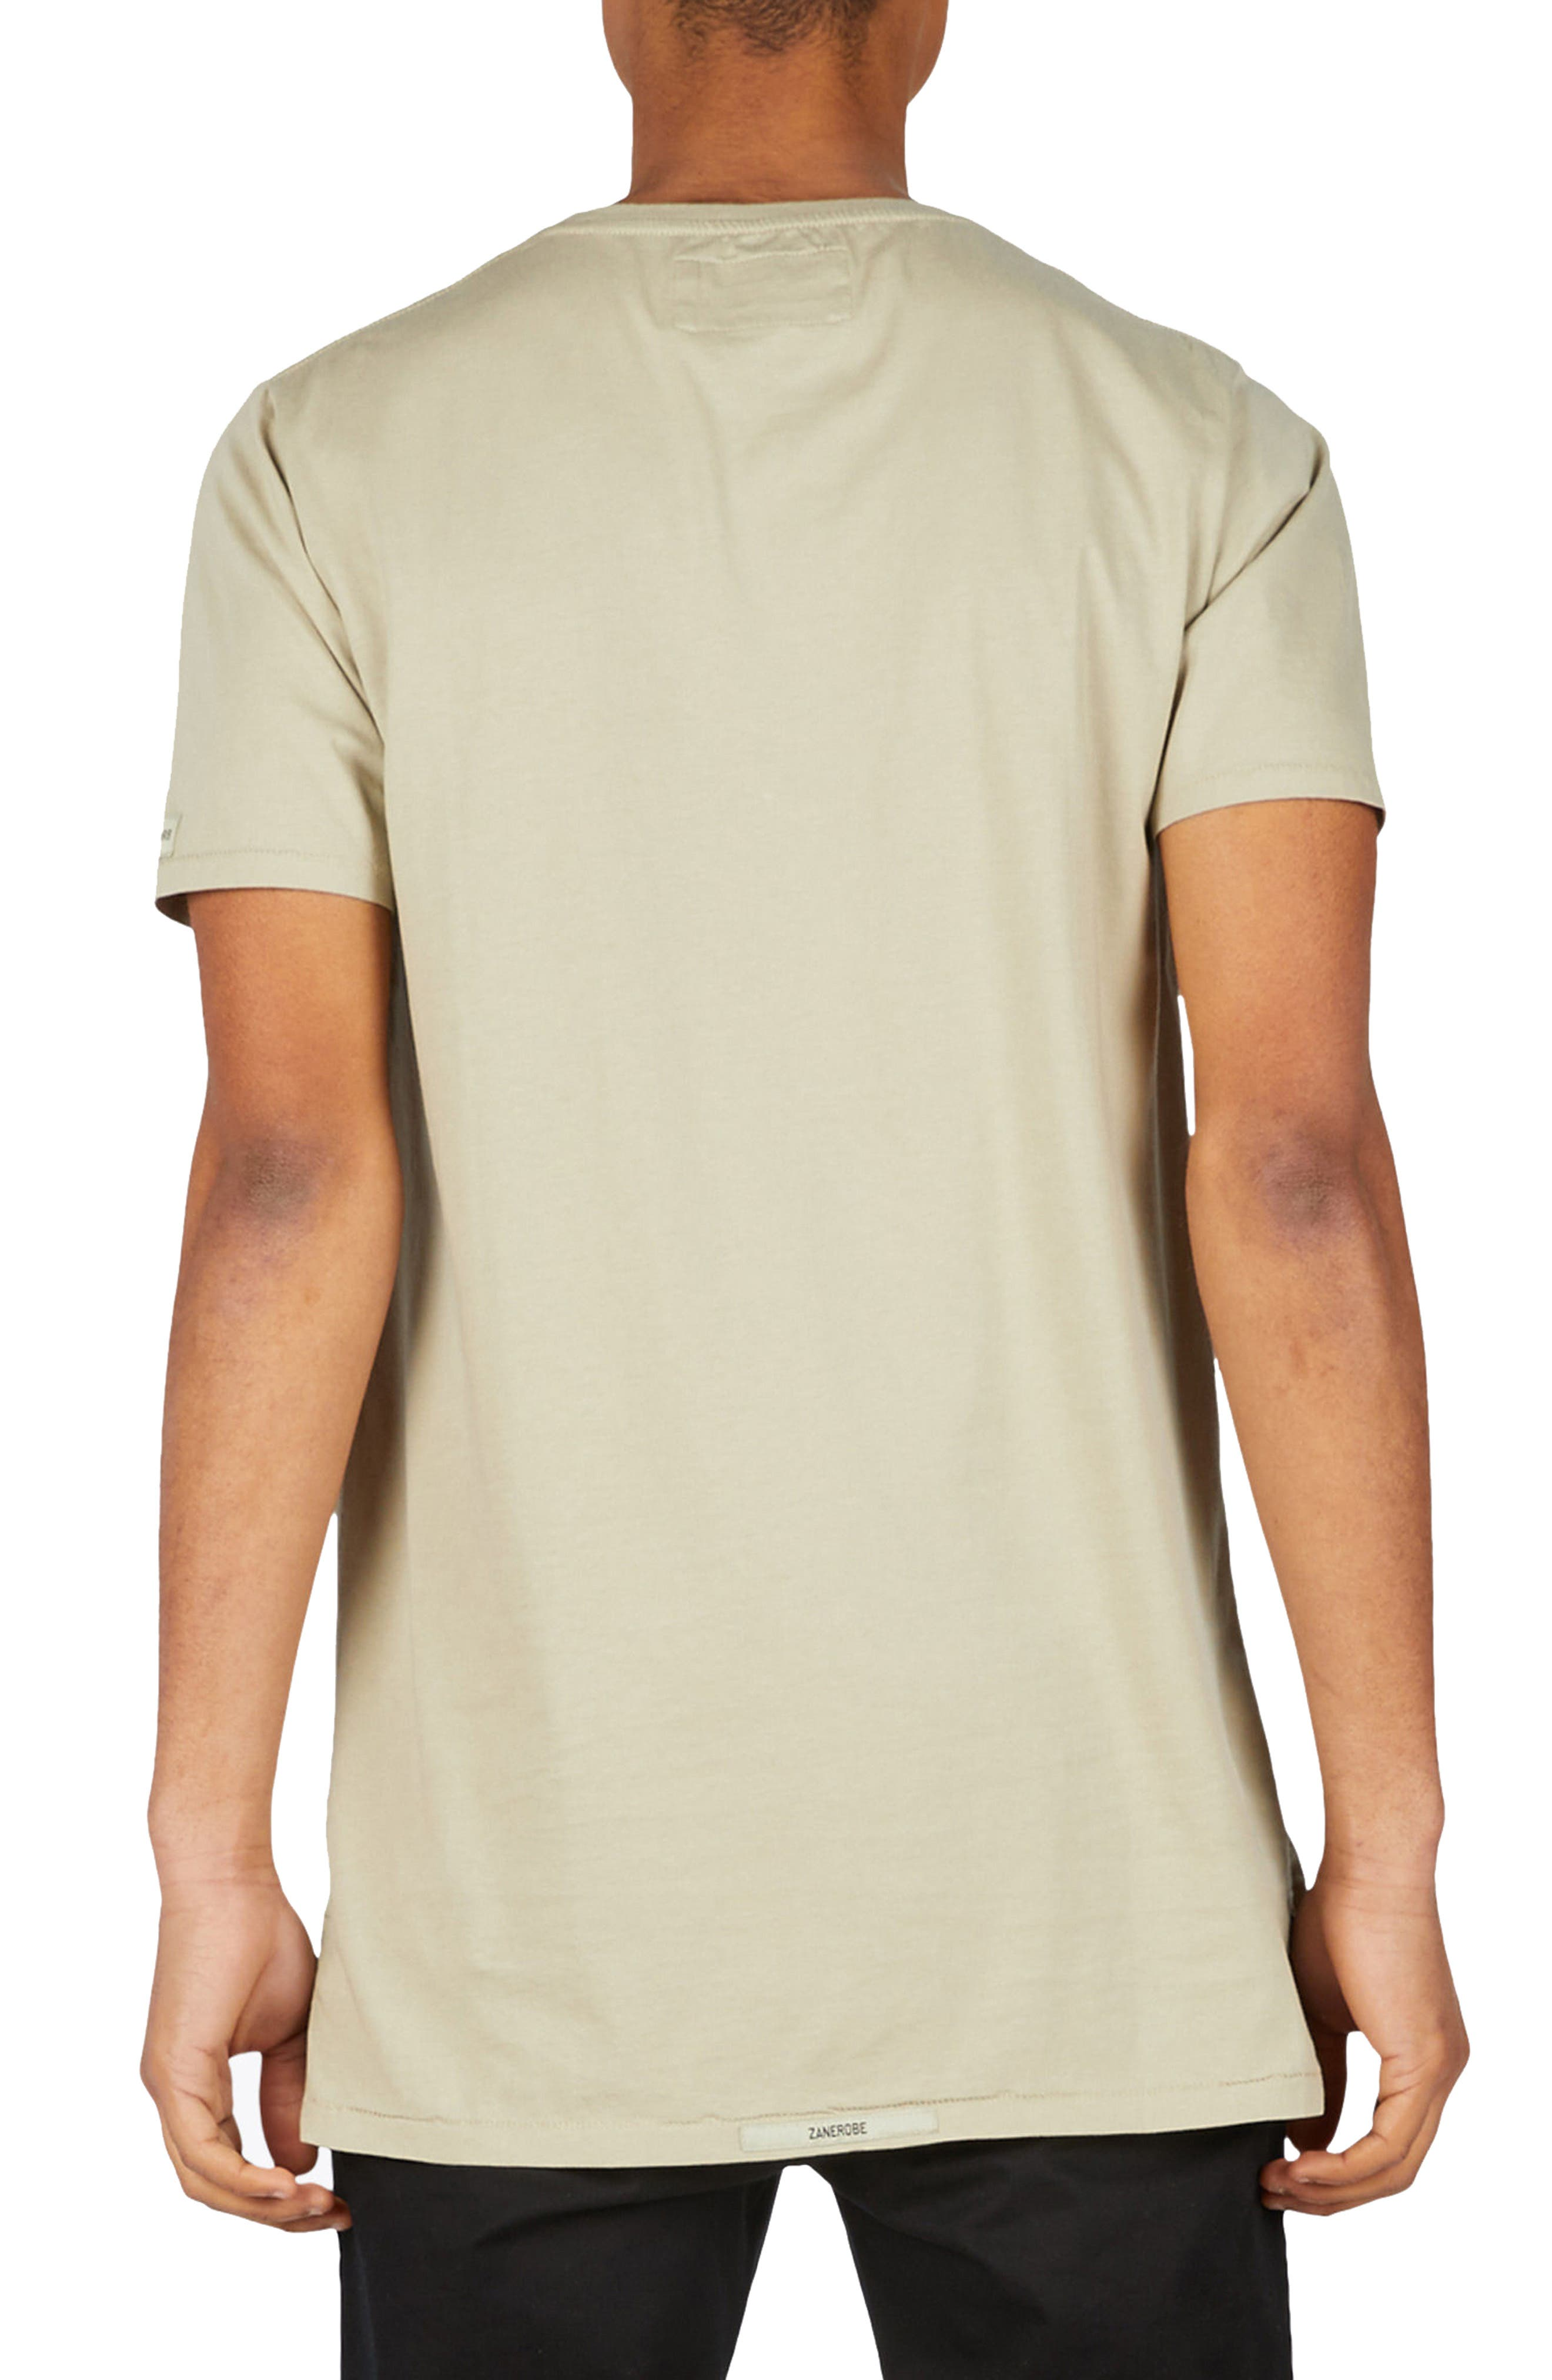 Flintlock T-Shirt,                             Alternate thumbnail 2, color,                             350